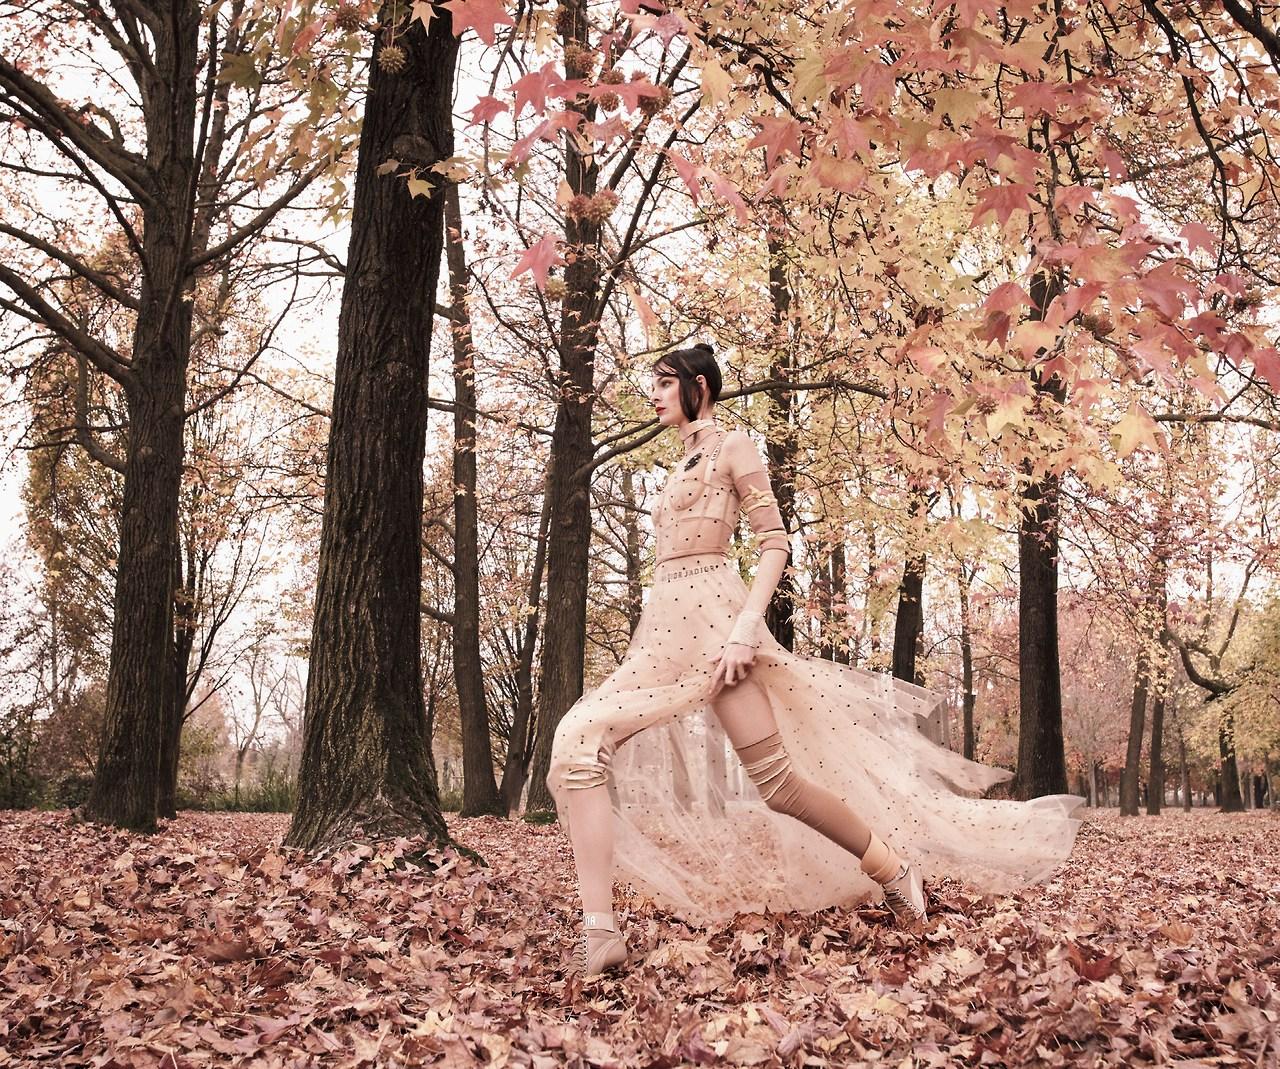 These Broken Dreams / Vogue Japan April 2017 - Vittoria Ceretti фото Luigi Murenu and Iango Henzi